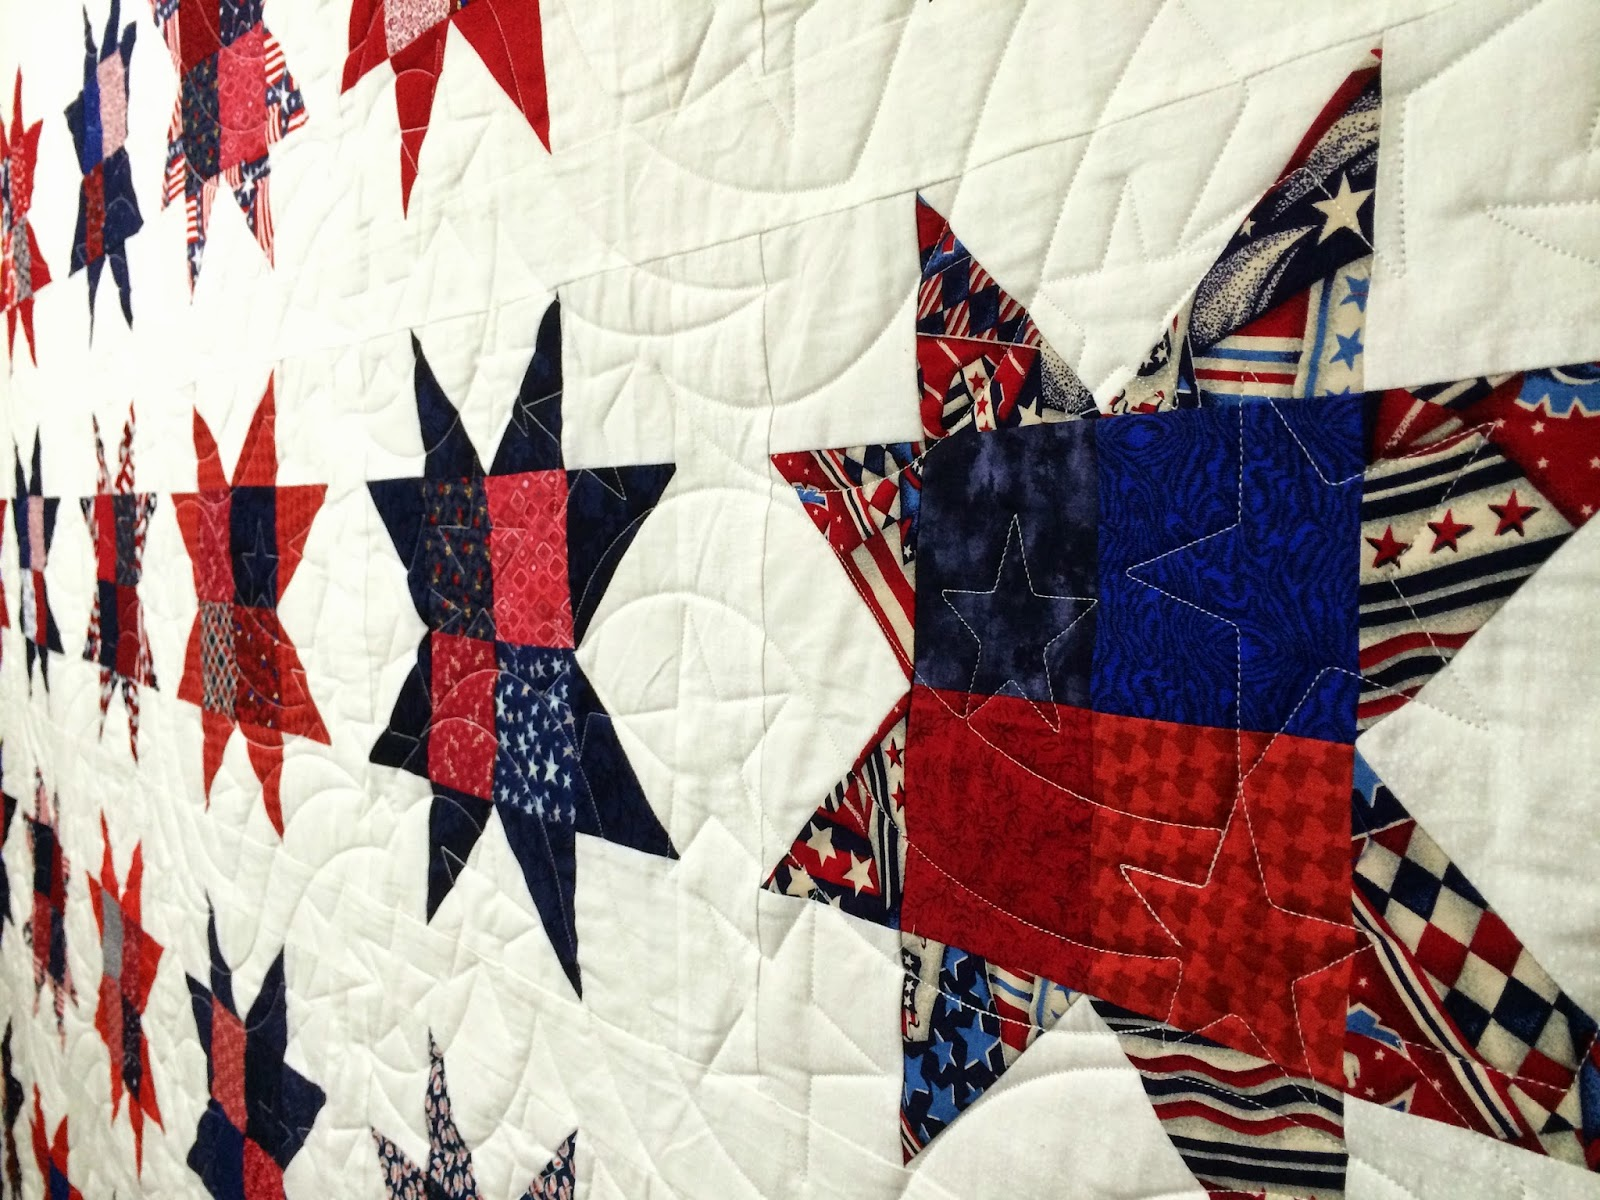 Peggy Kreb's Missouri Stars Quilt